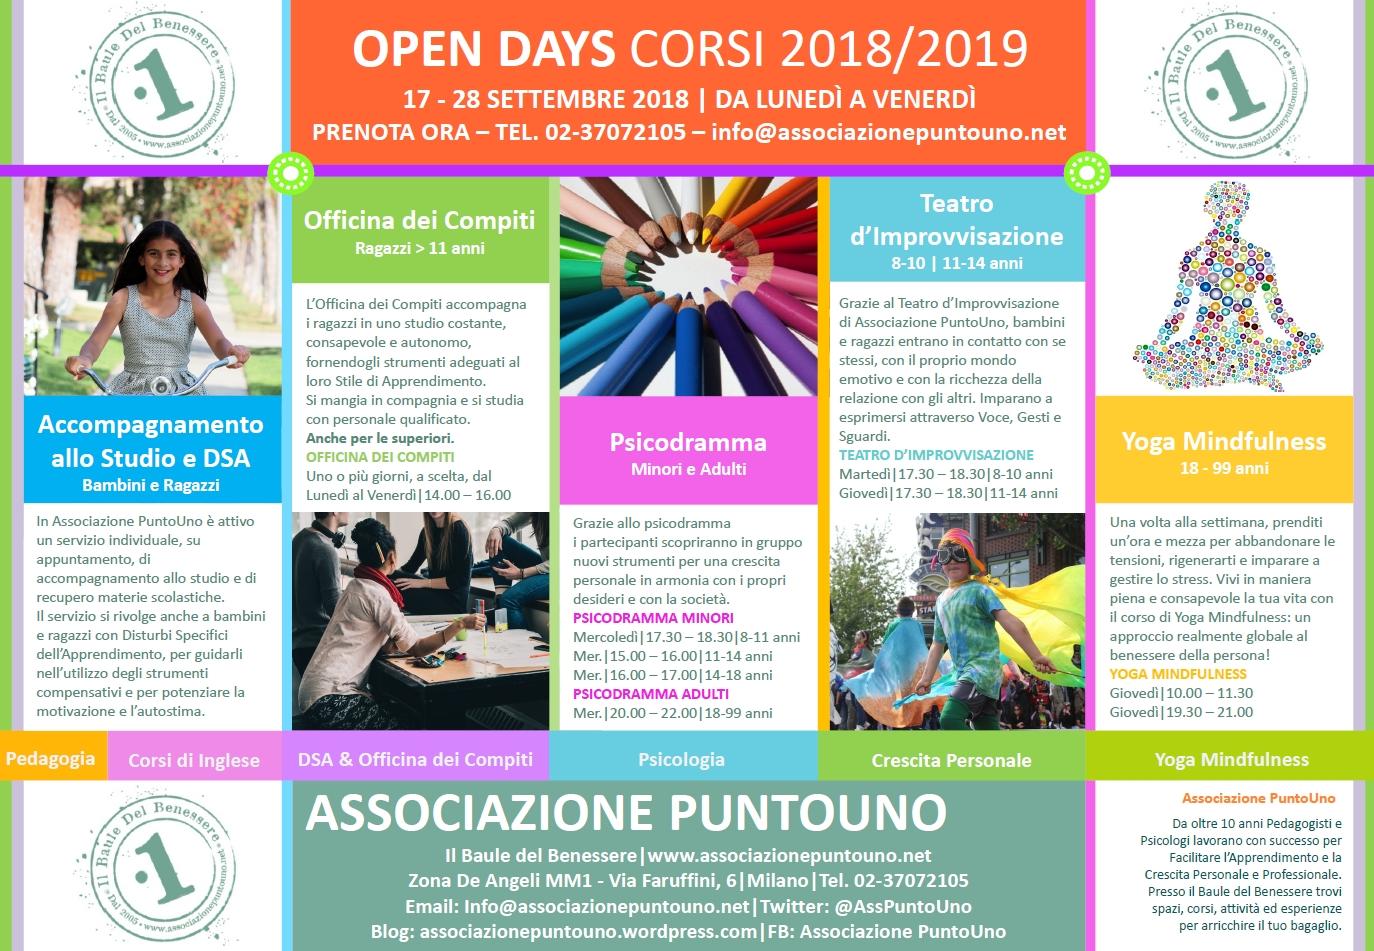 PDF Associazione PuntoUno Open Days Corsi Calendar 2018 2019 PAG2